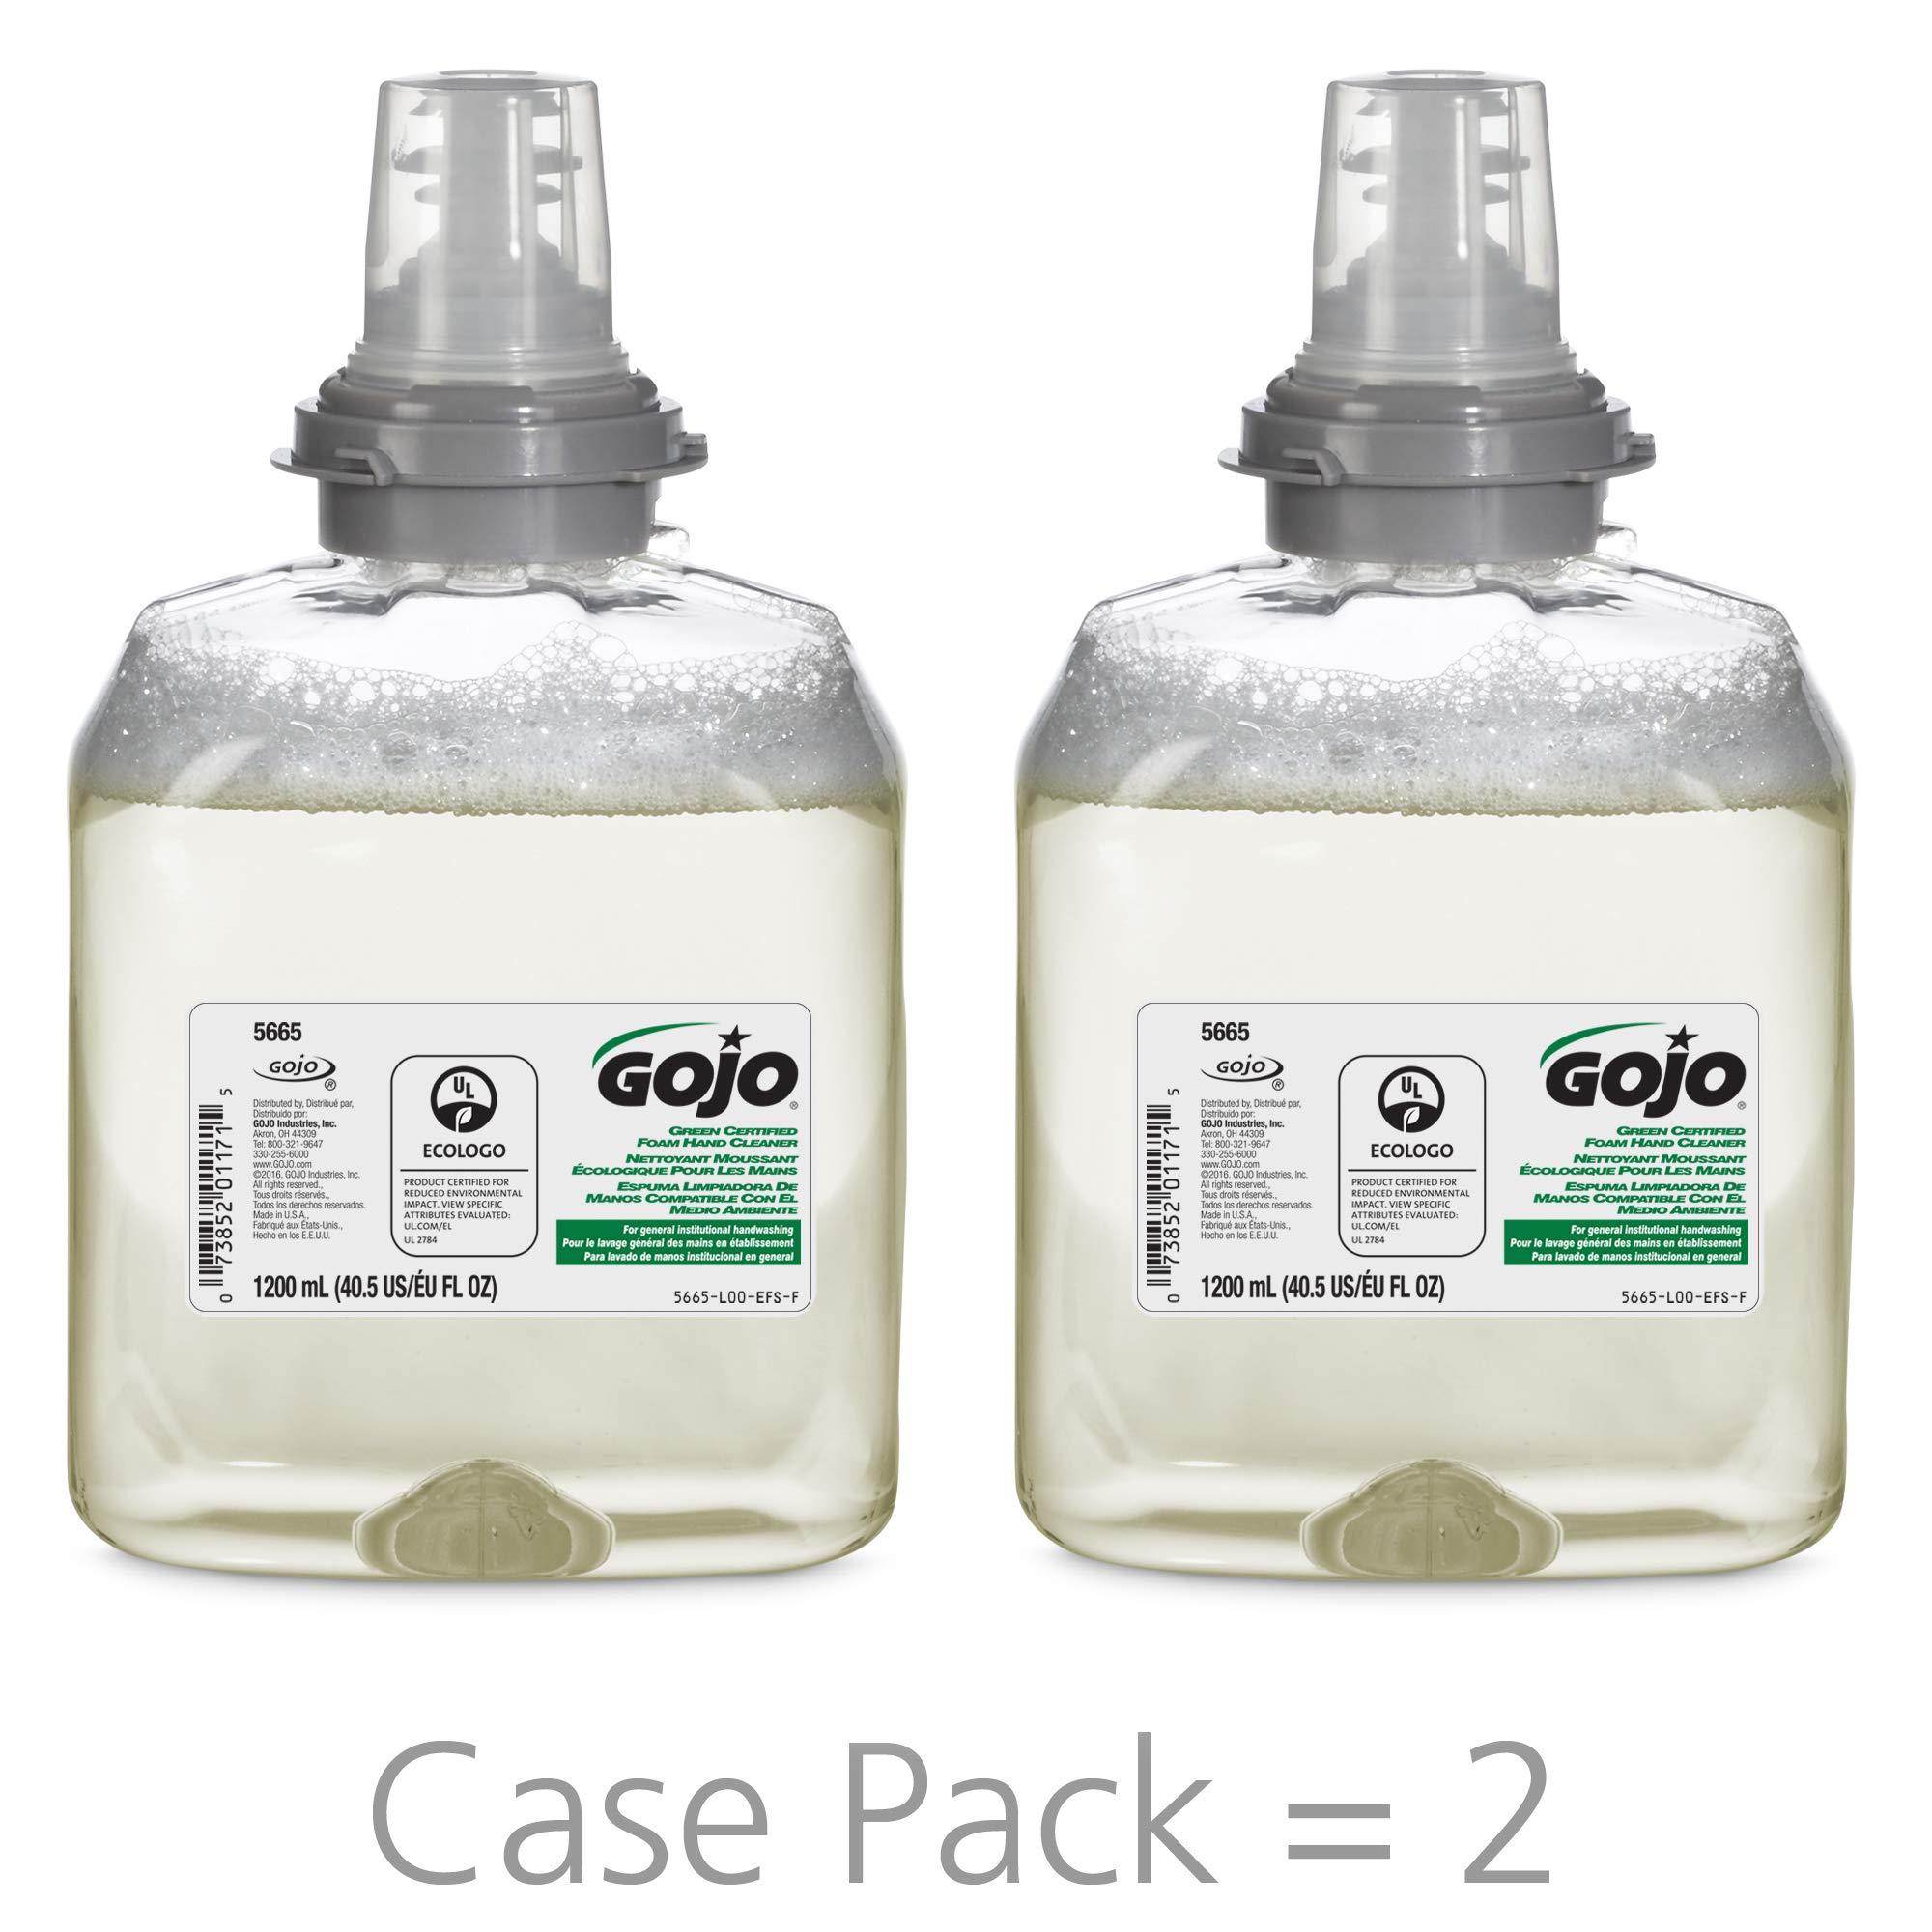 GOJO TFX Green Certified Foam Hand Cleaner, Fragrance-Free, EcoLogo Certified, 1200 mL Soap Refill for GOJO TFX Touch-Free Dispenser (Pack of 2) – 5665-02